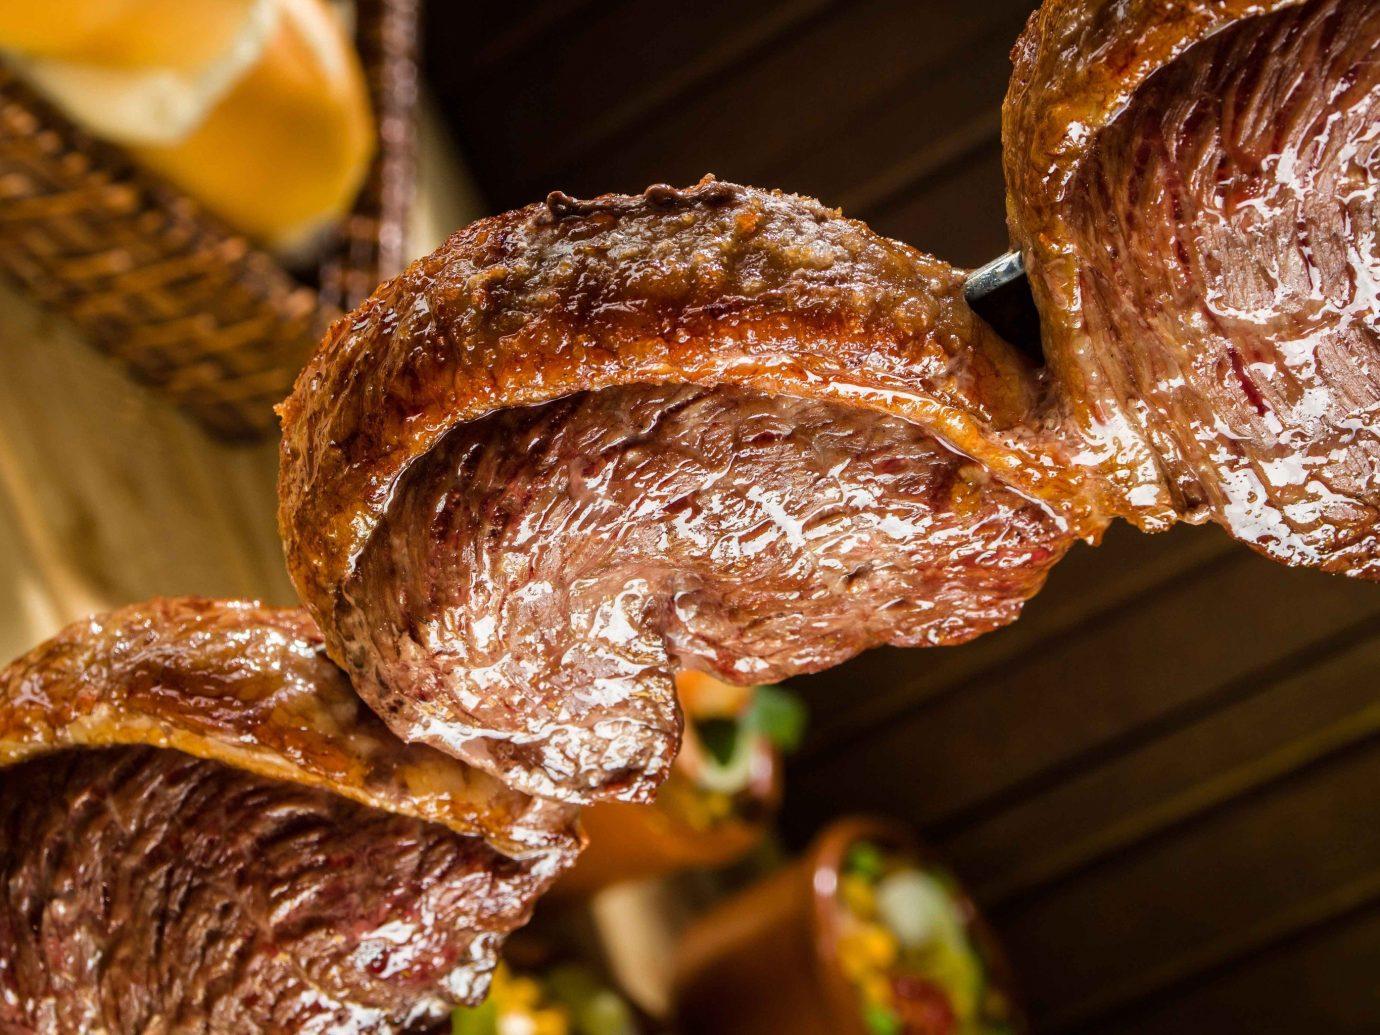 Food + Drink food meat organ medicinal mushroom produce meal baked close barbecue